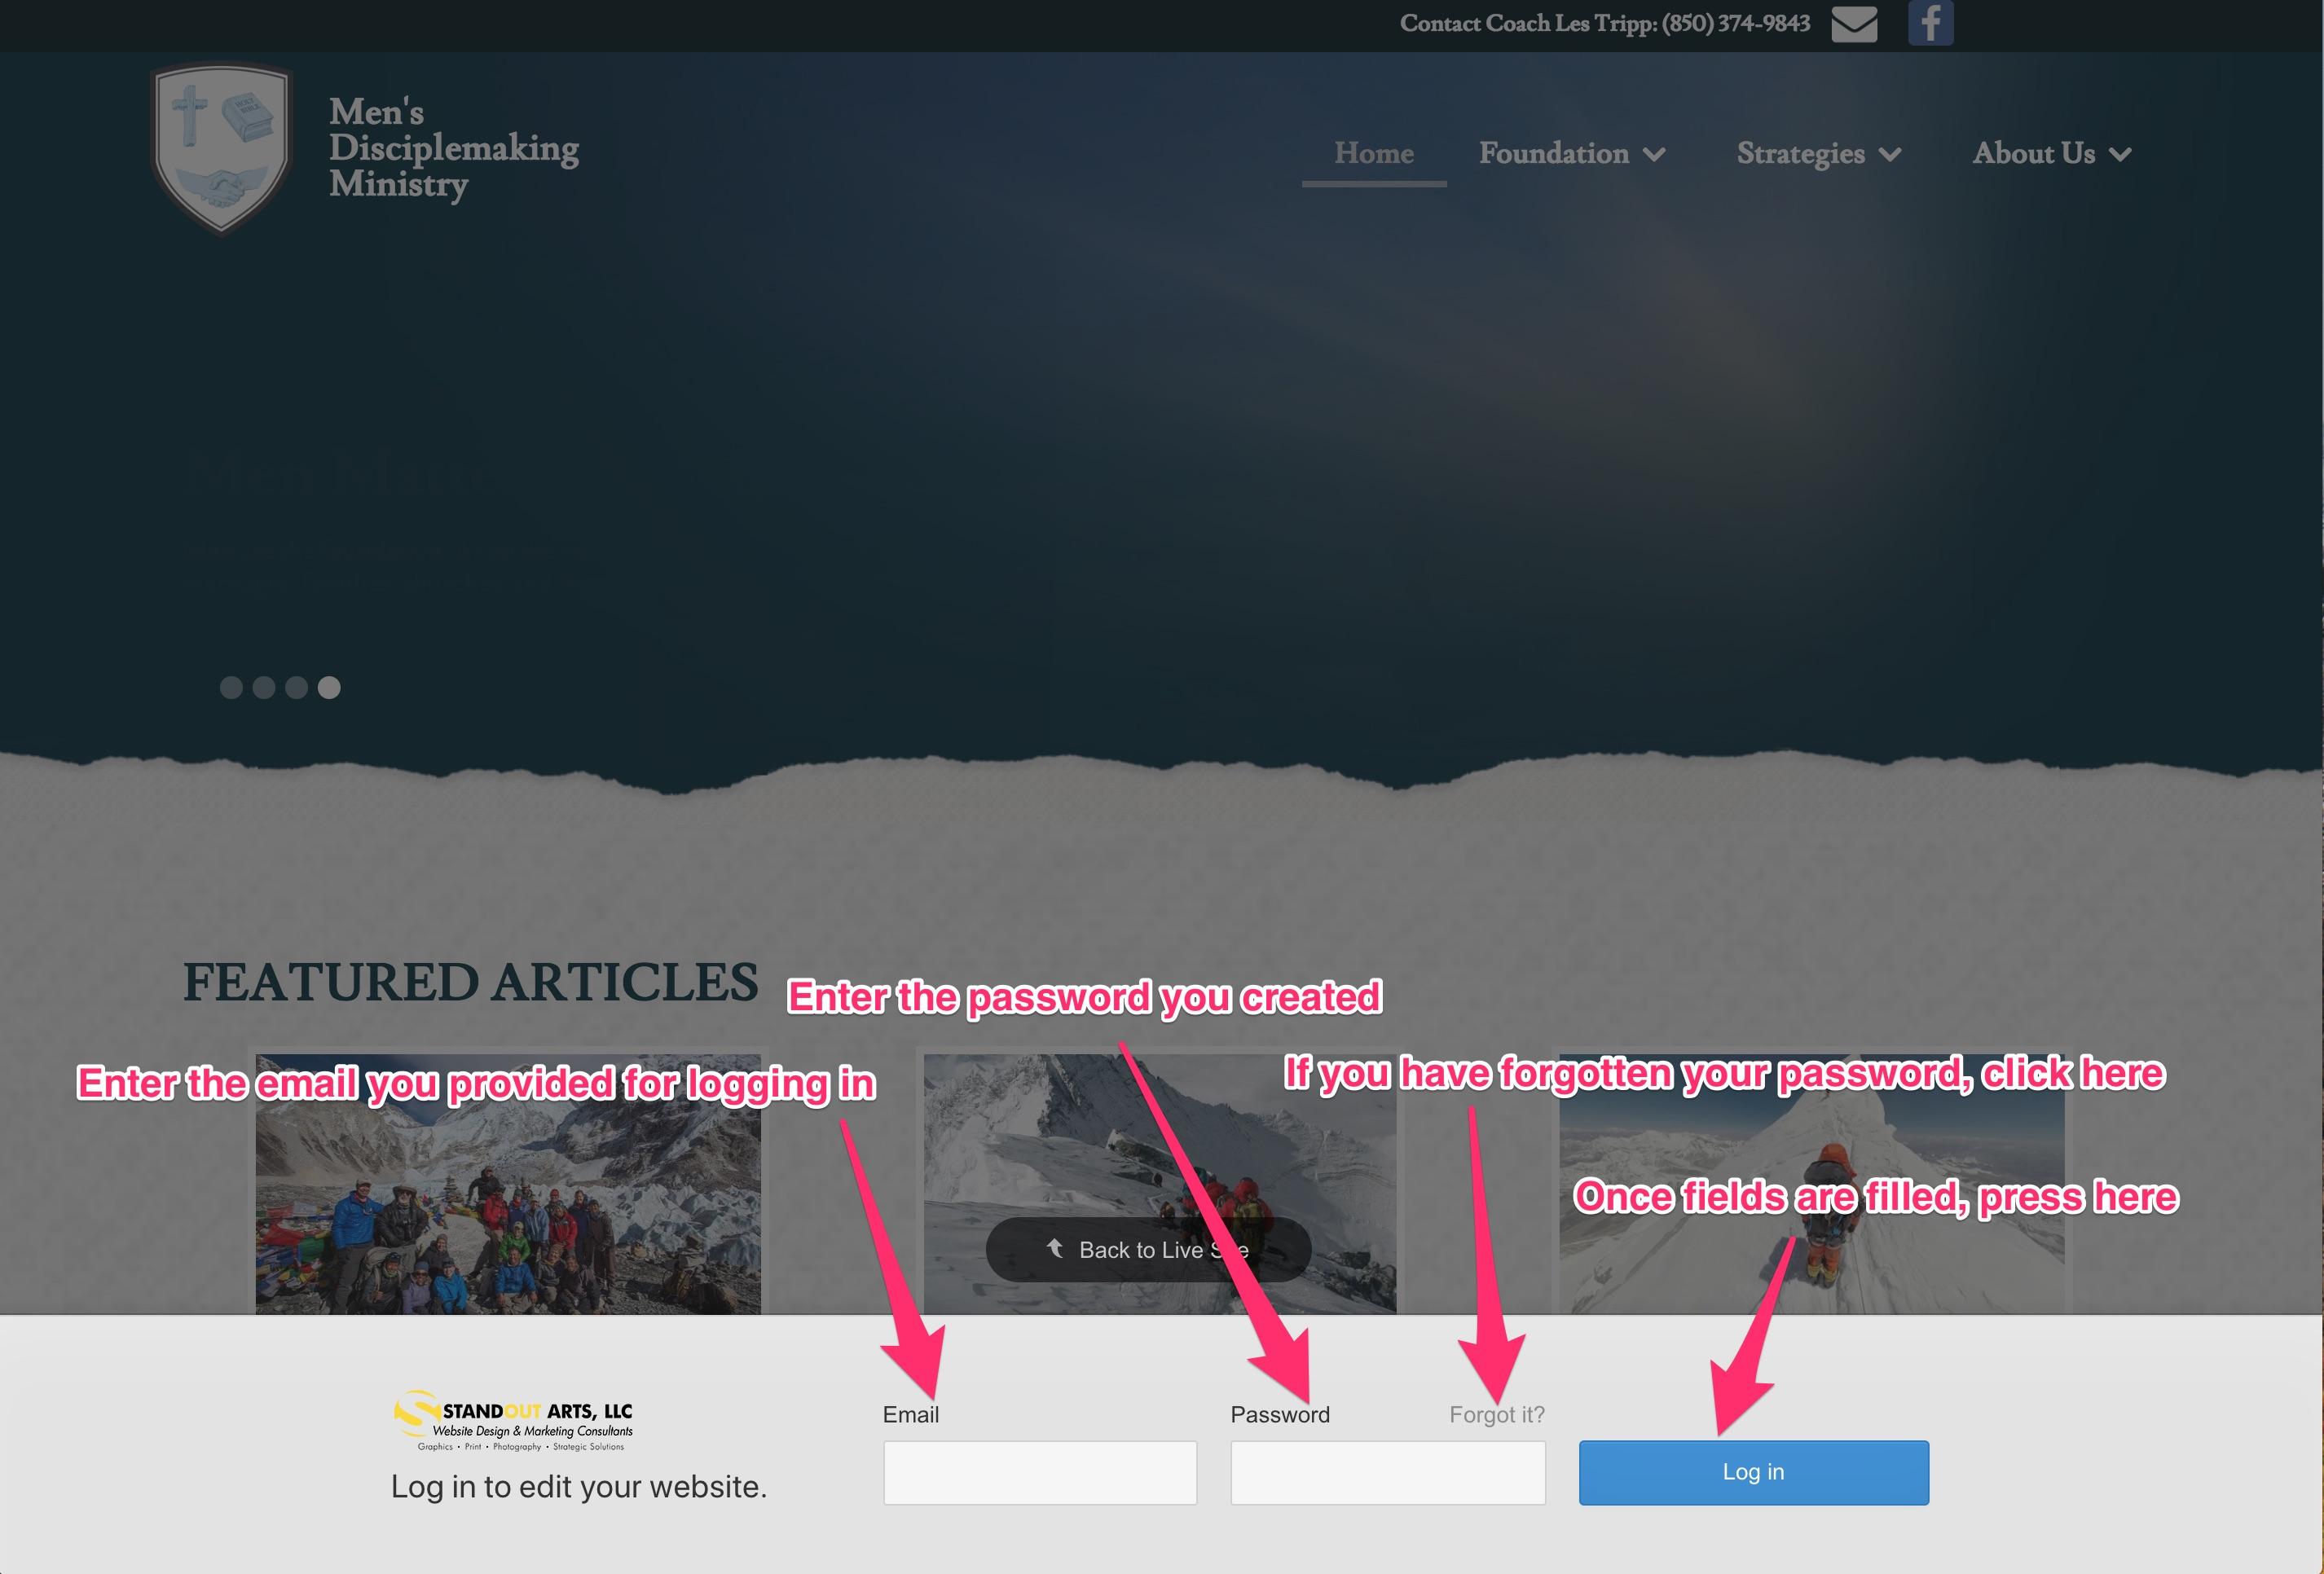 MDM editor login page